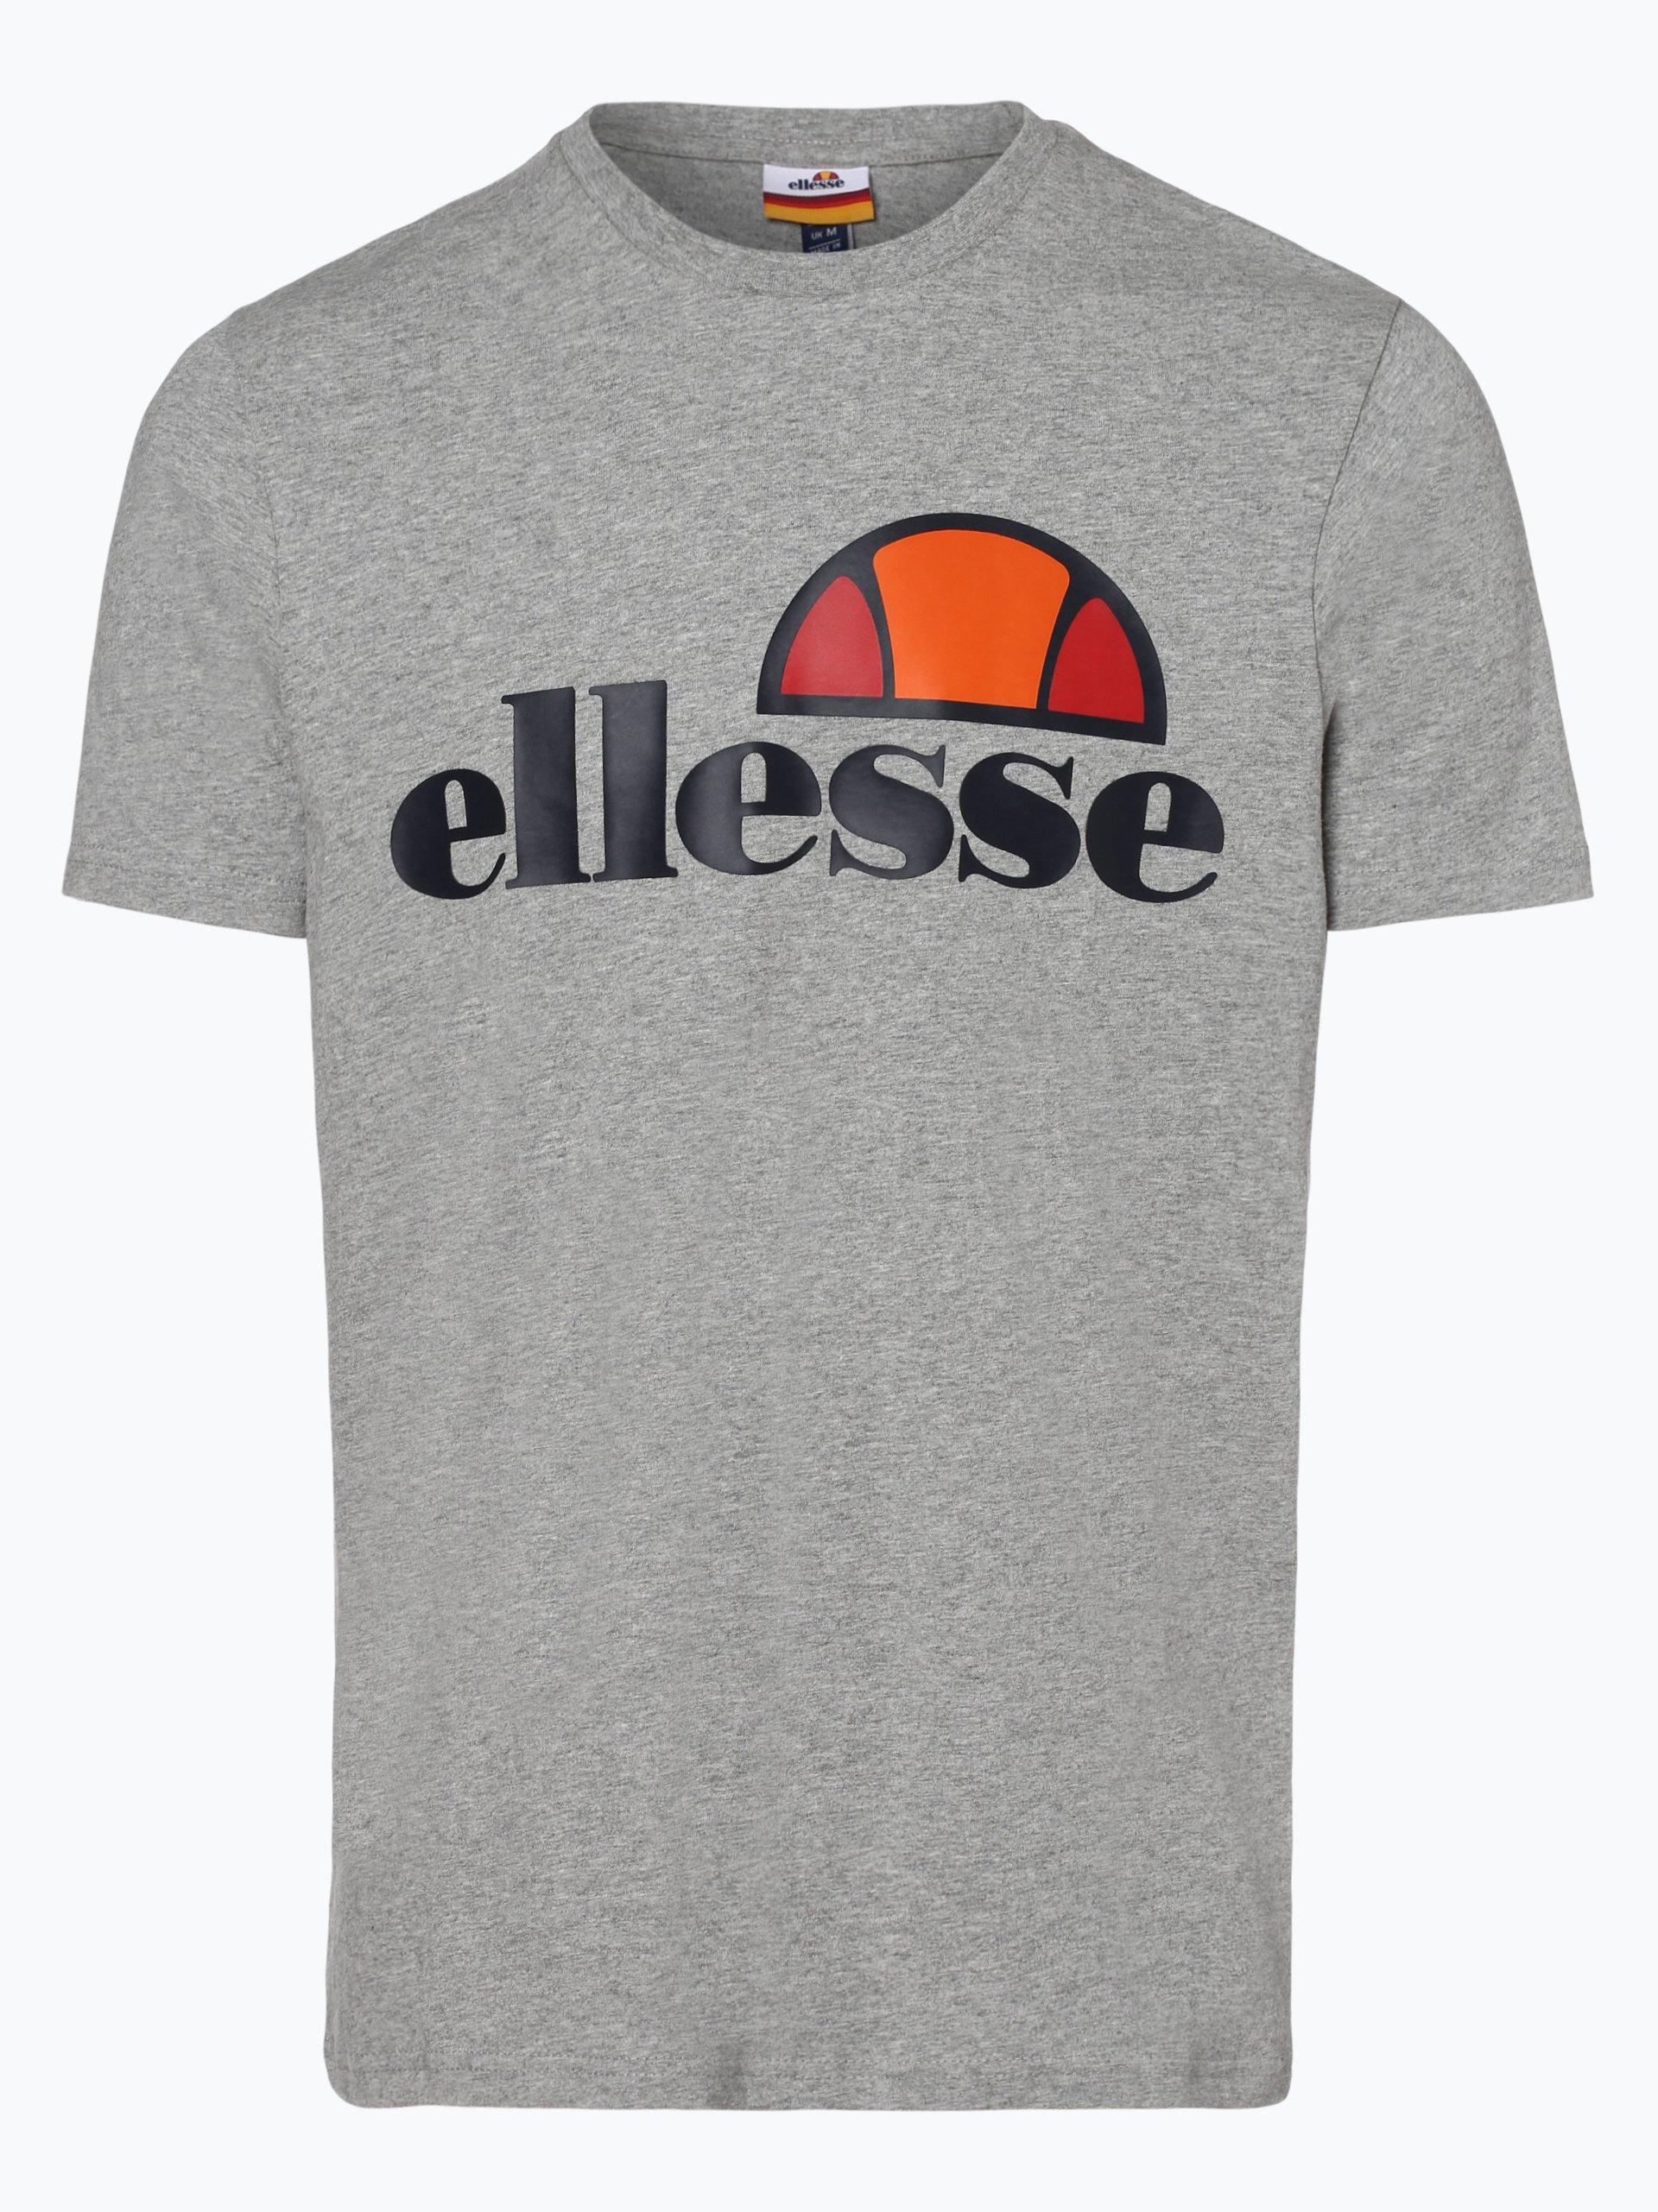 ellesse T-shirt męski